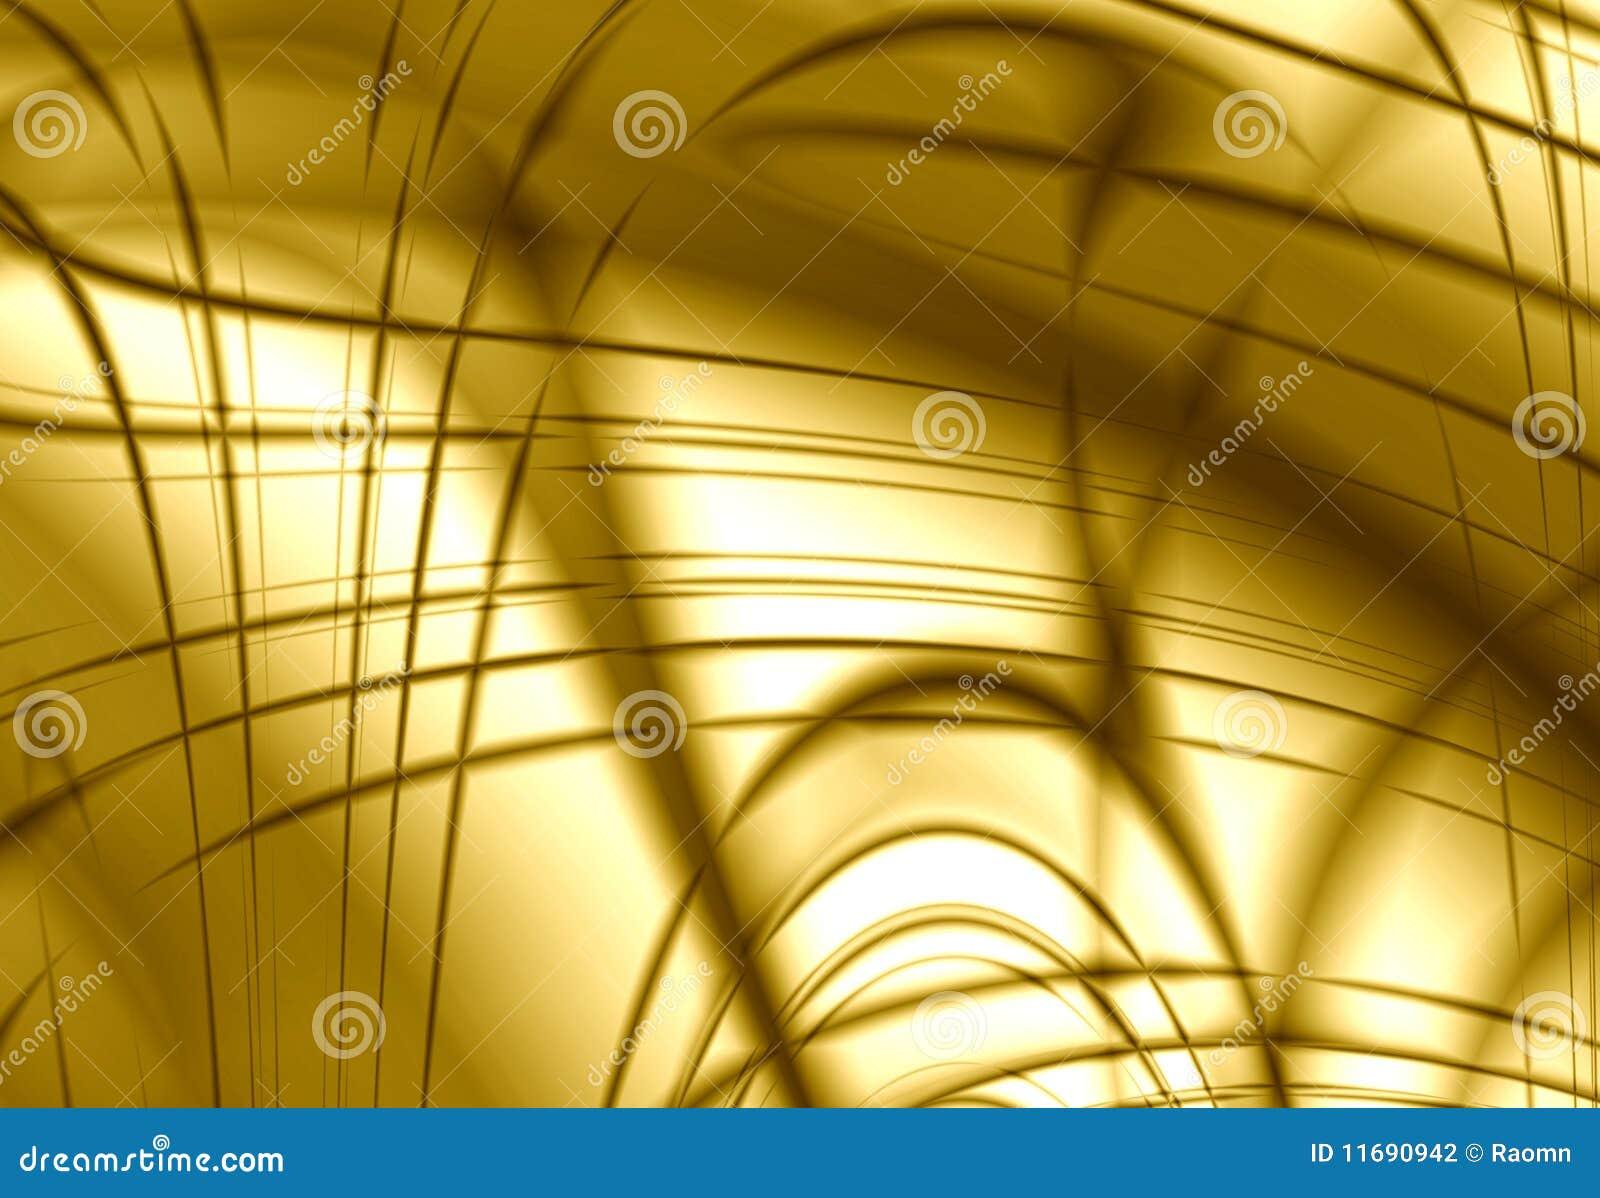 Gold Yellow Card Wallpaper